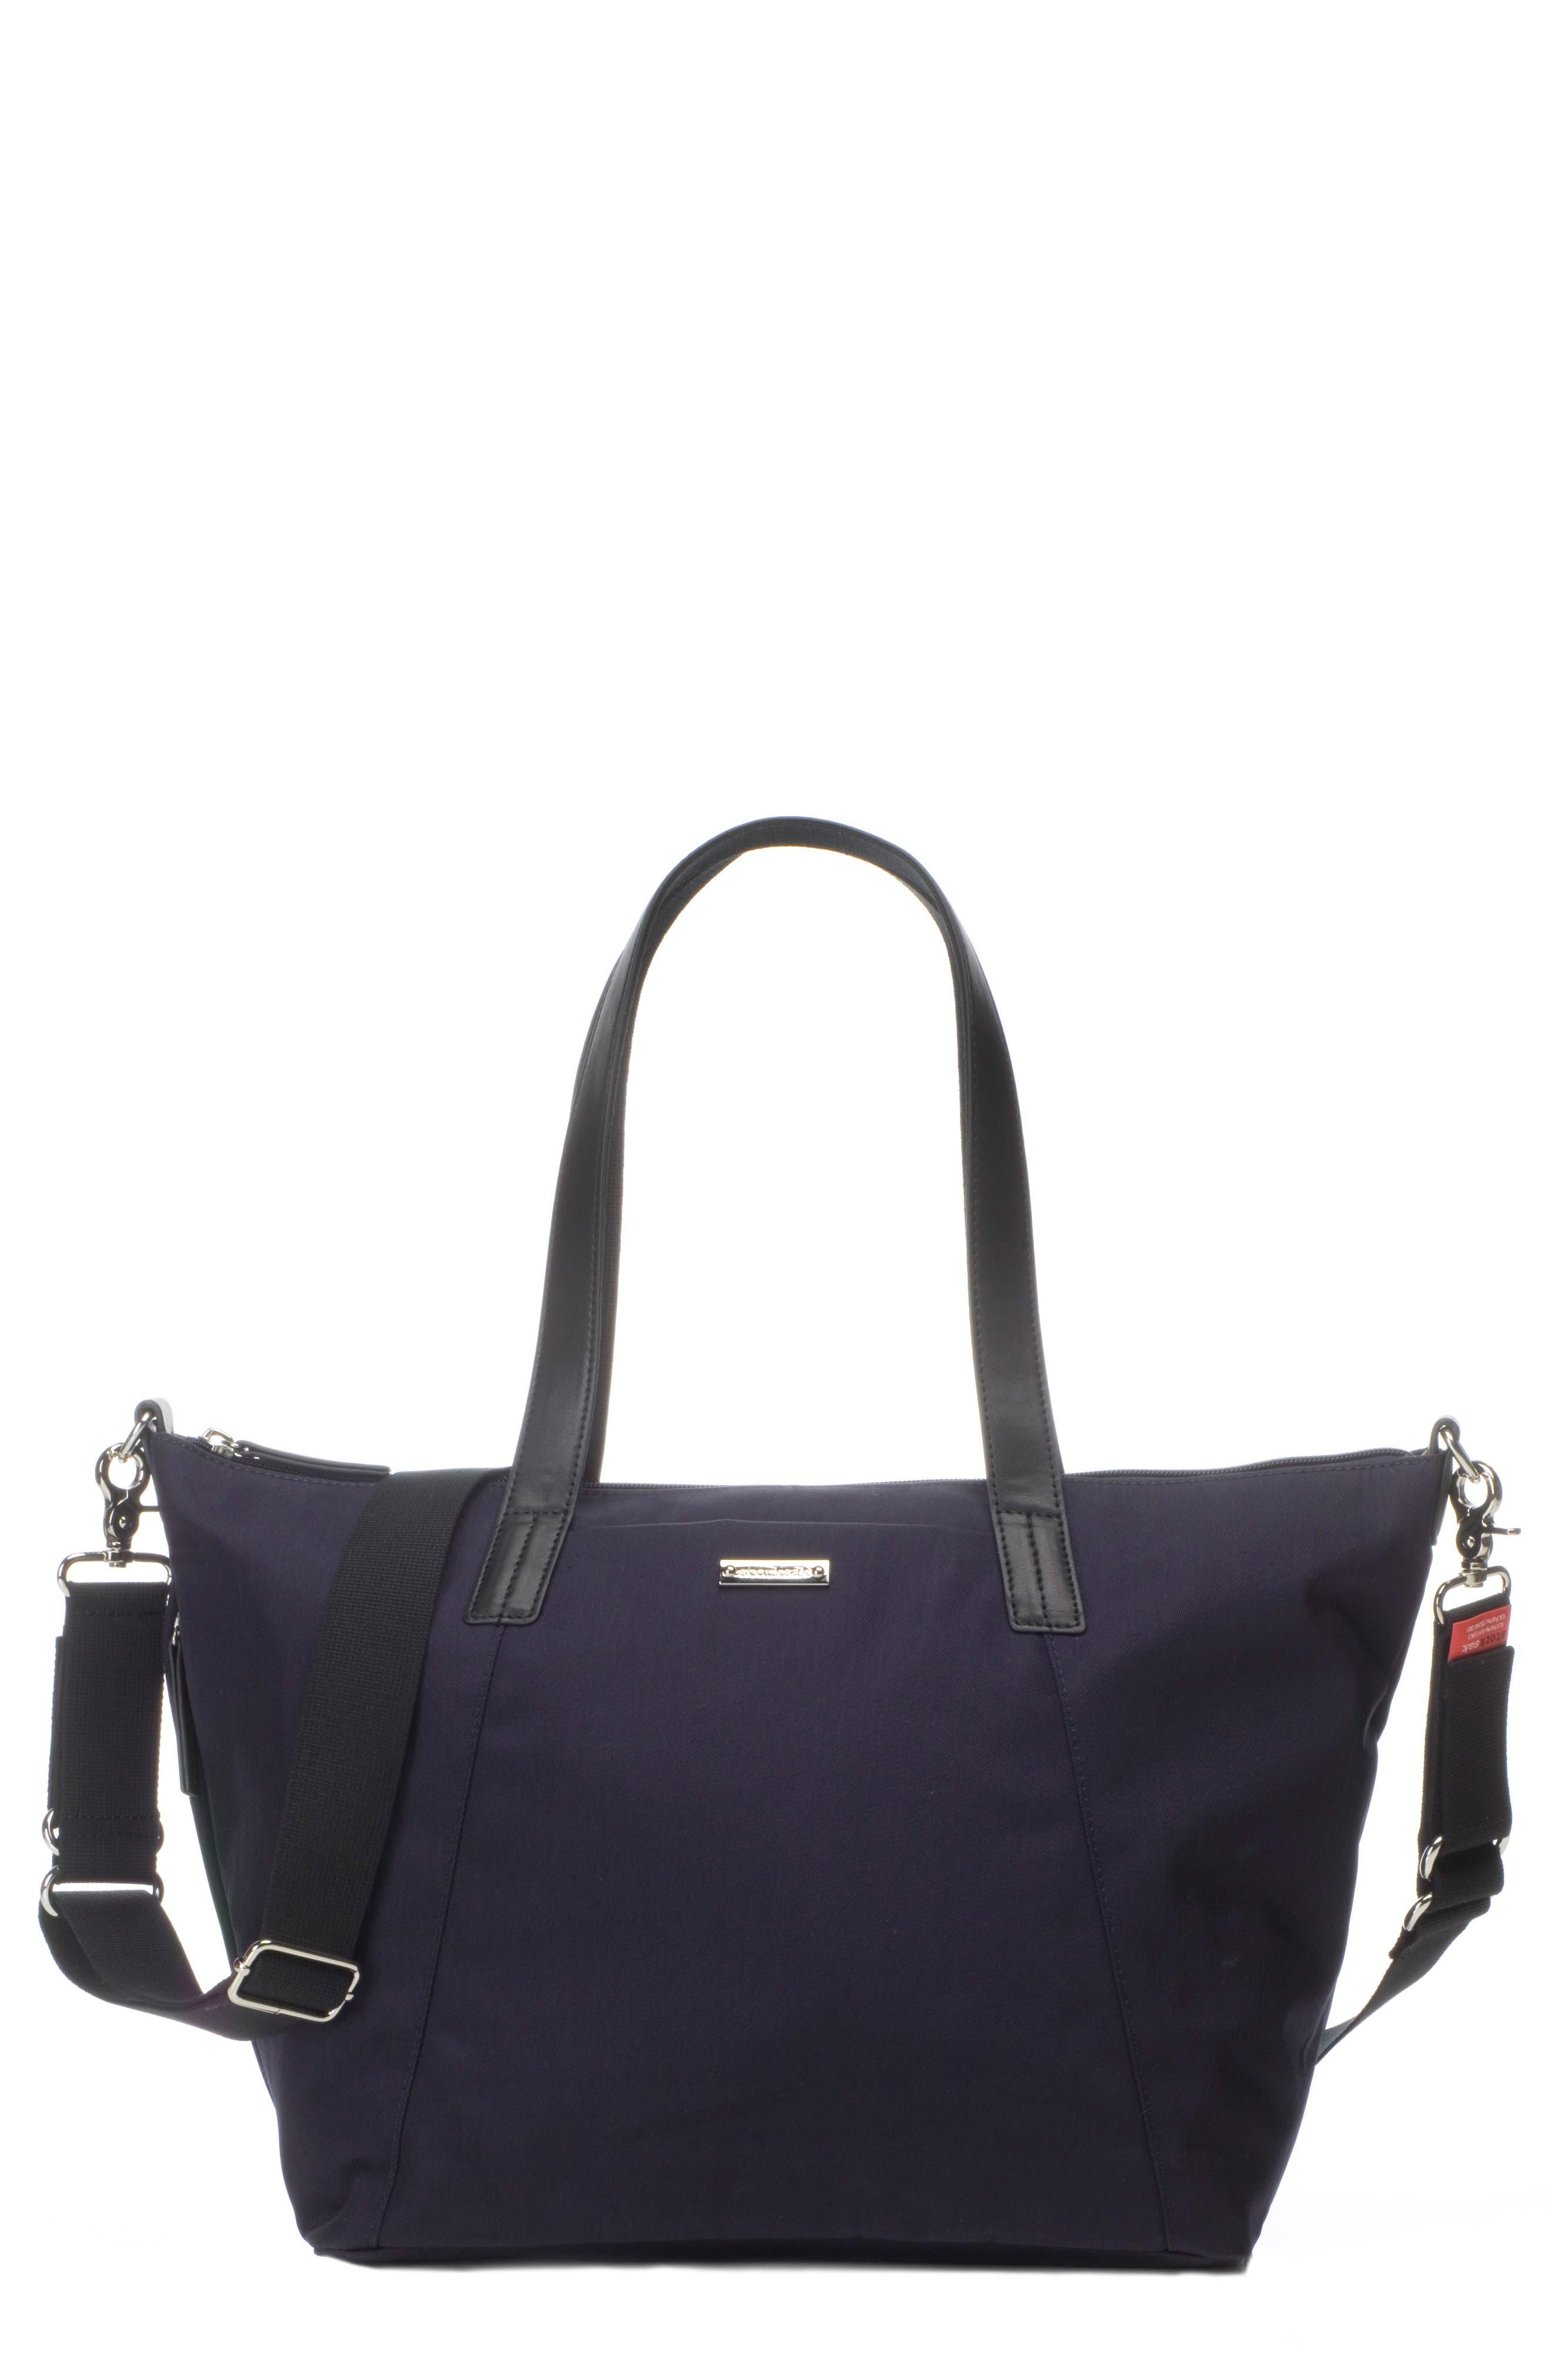 Noa Luxe Diaper Bag,                             Main thumbnail 1, color,                             Midnight Blue